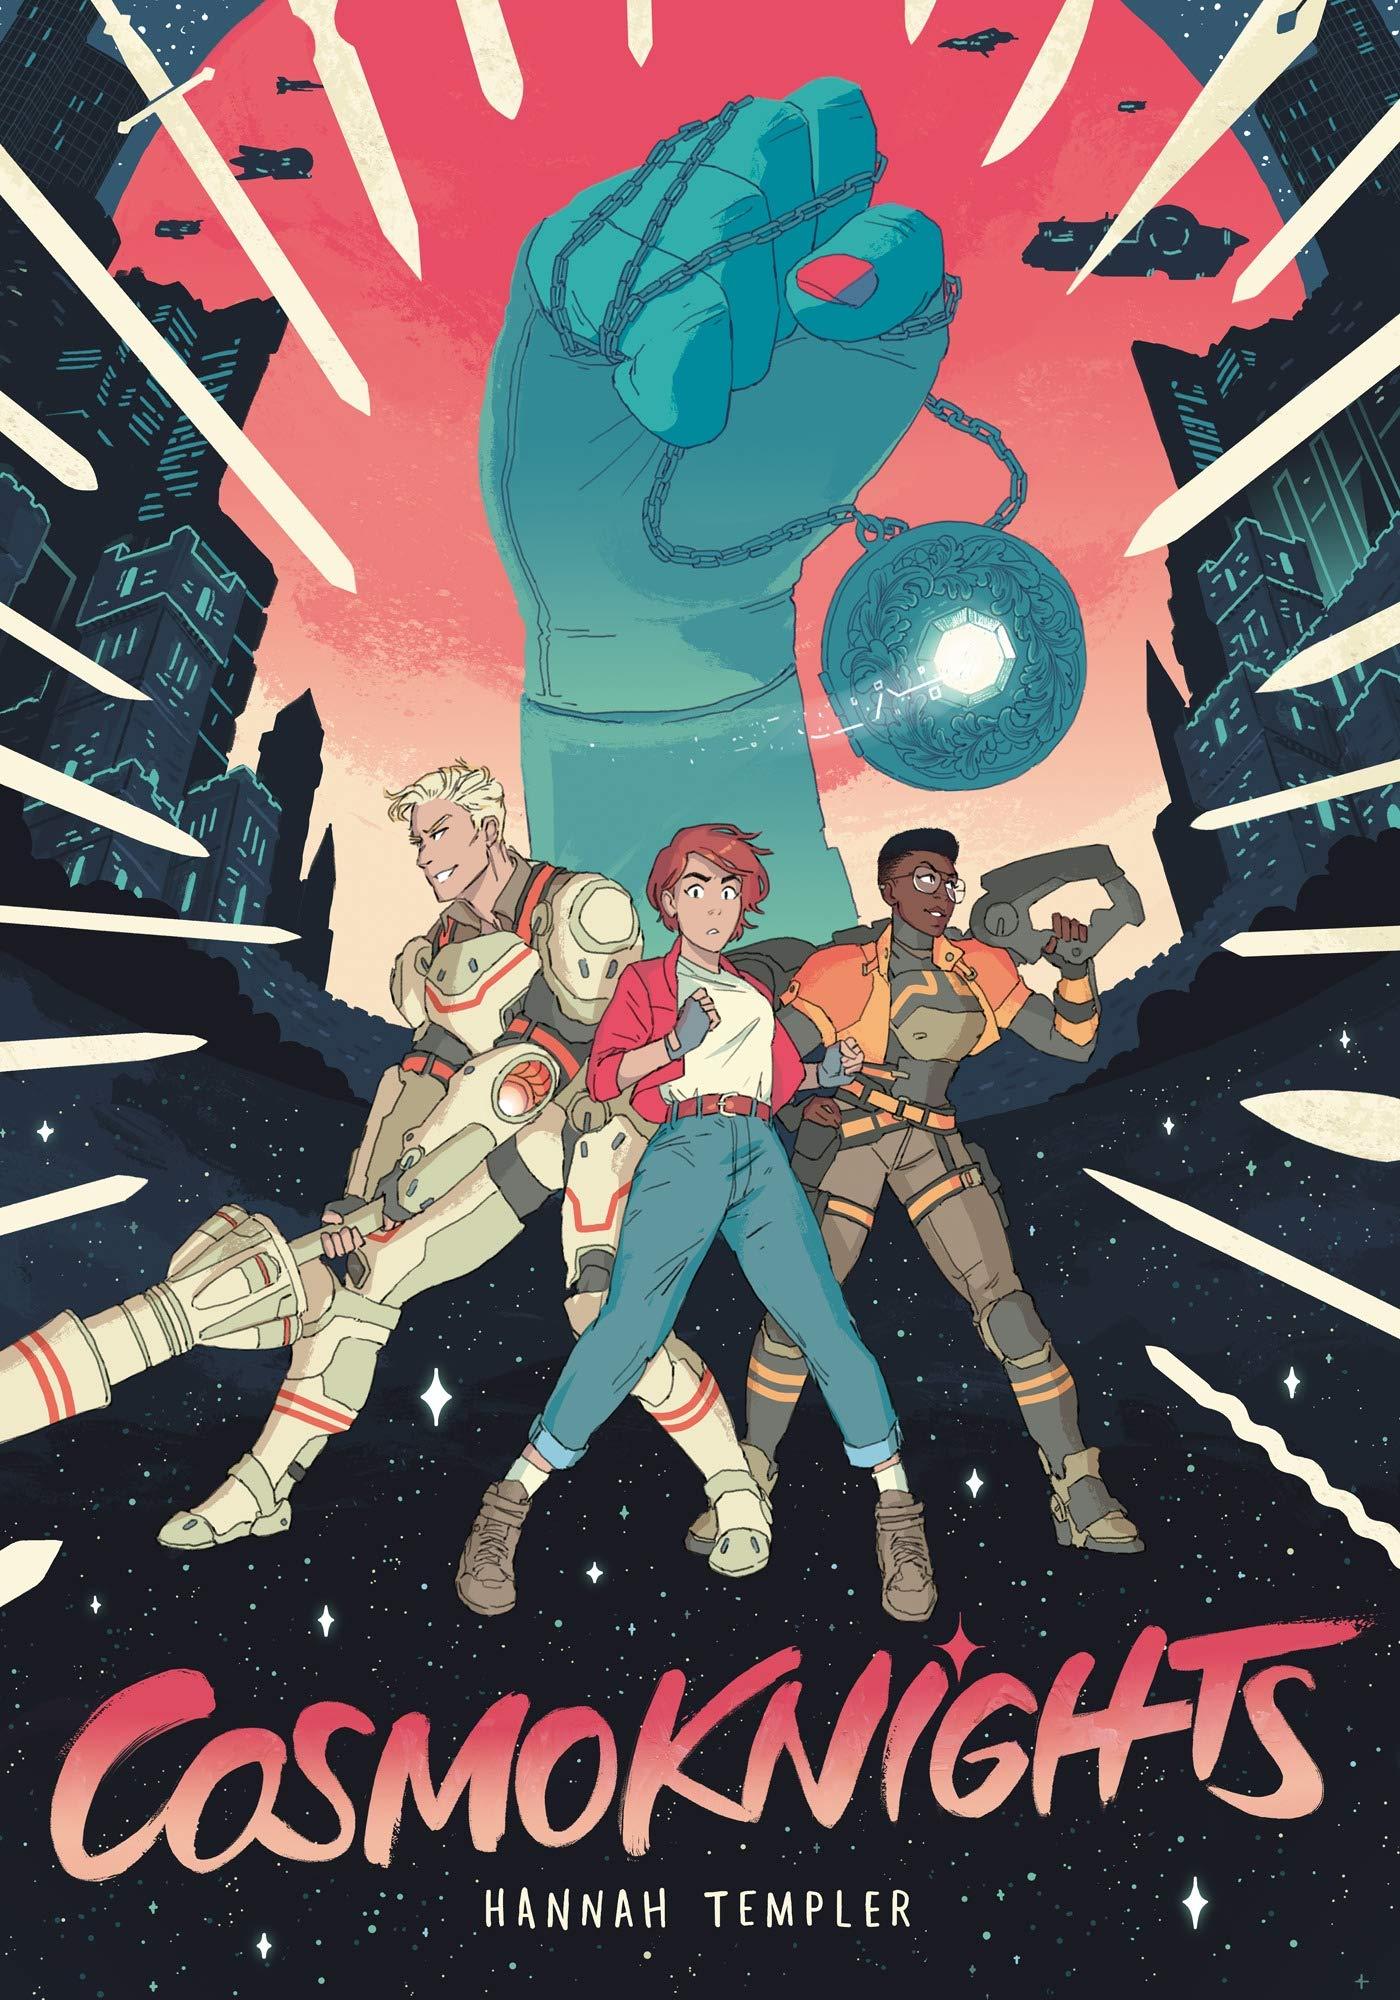 Best Comics of 2019: Cosmoknights